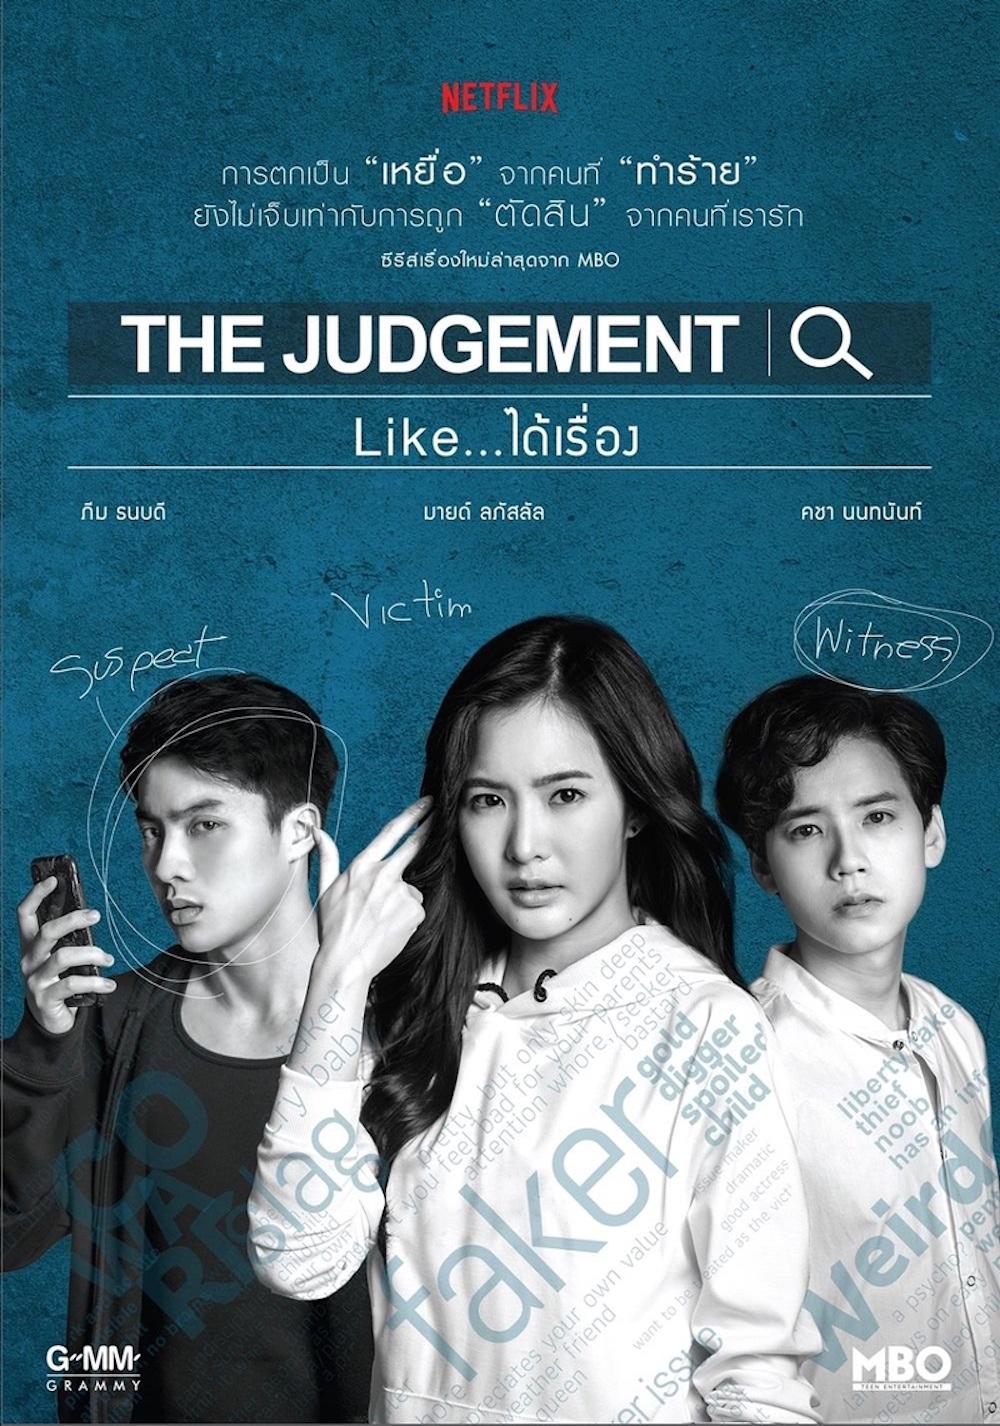 The Judgement (TV Series 2018– ) - IMDb